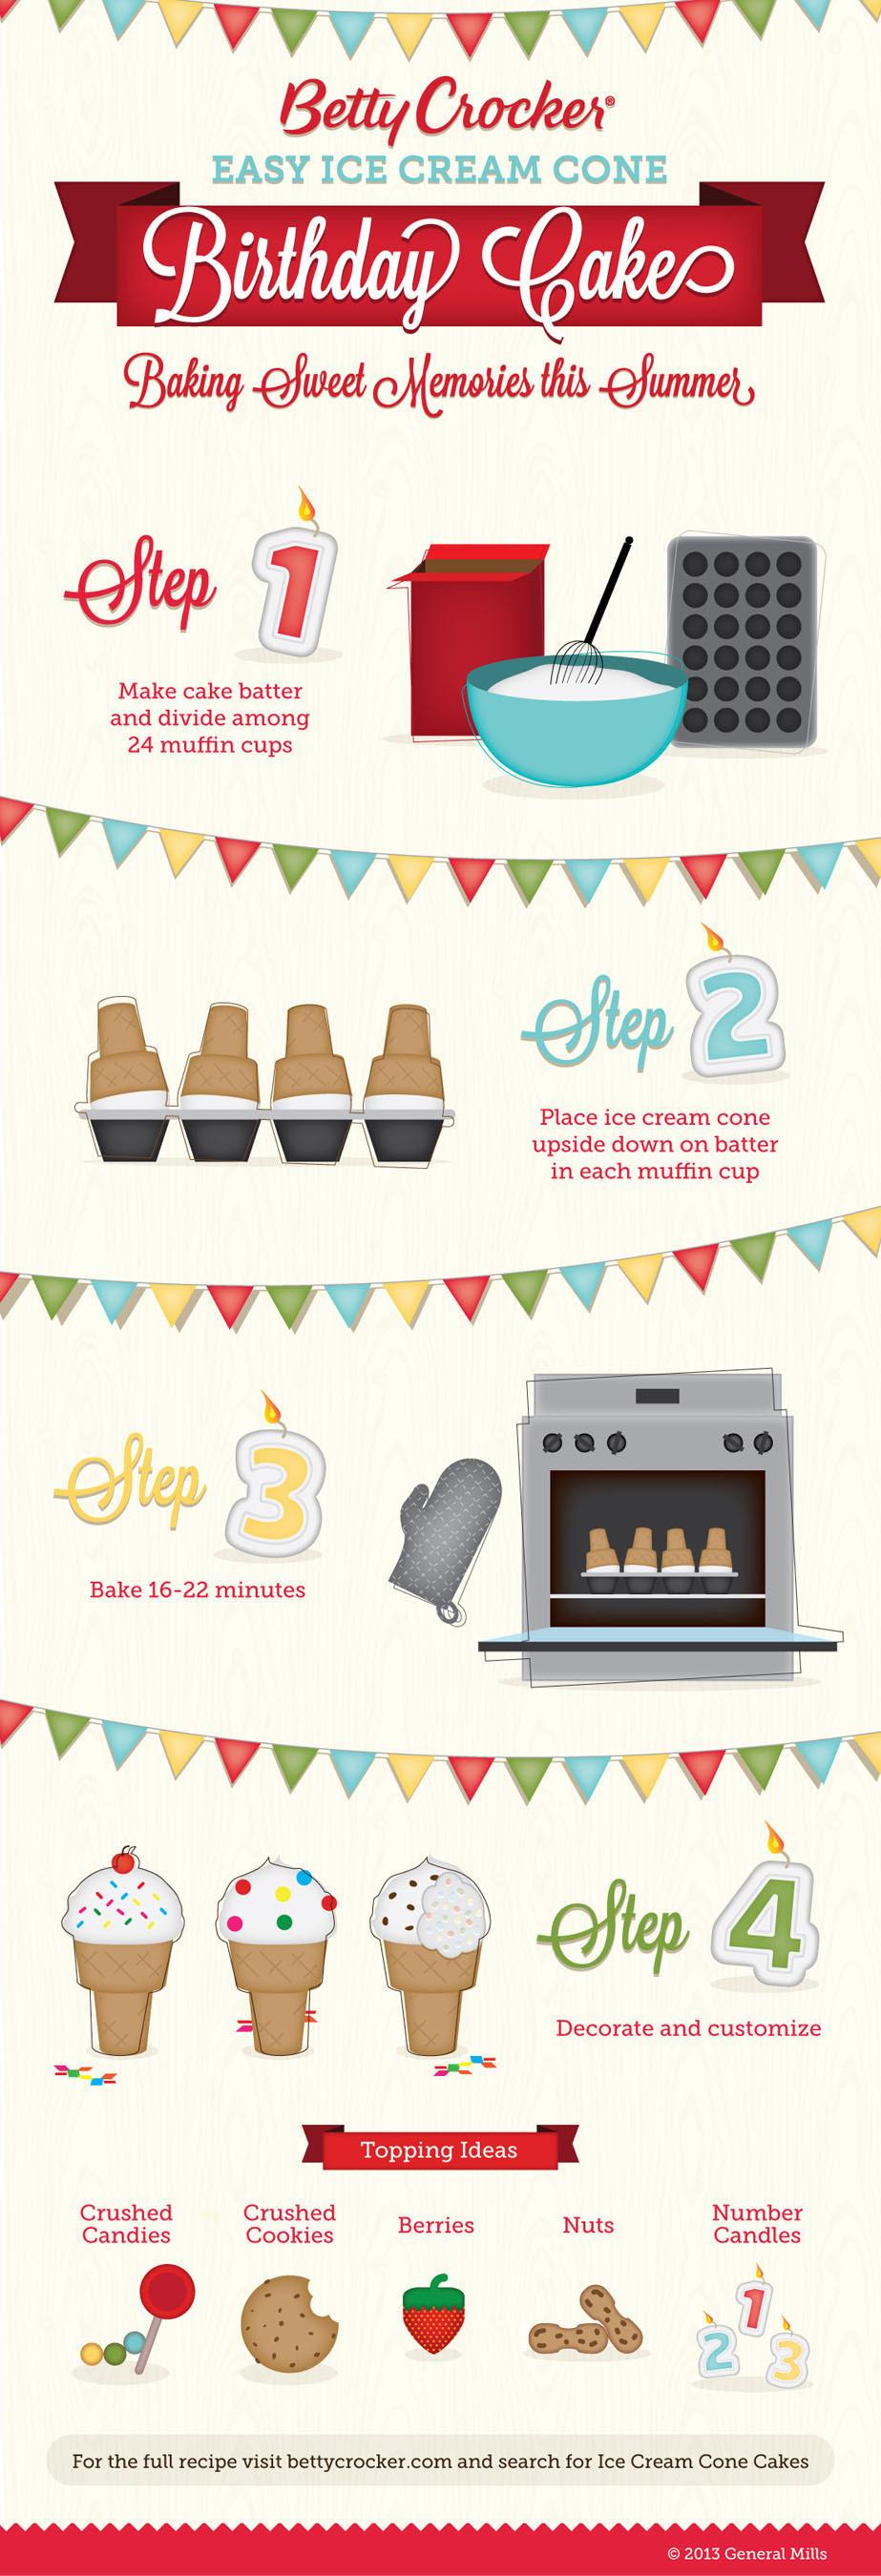 Betty Crocker Ice Cream Cone Cakes Infographic.(PRNewsFoto/Betty Crocker)